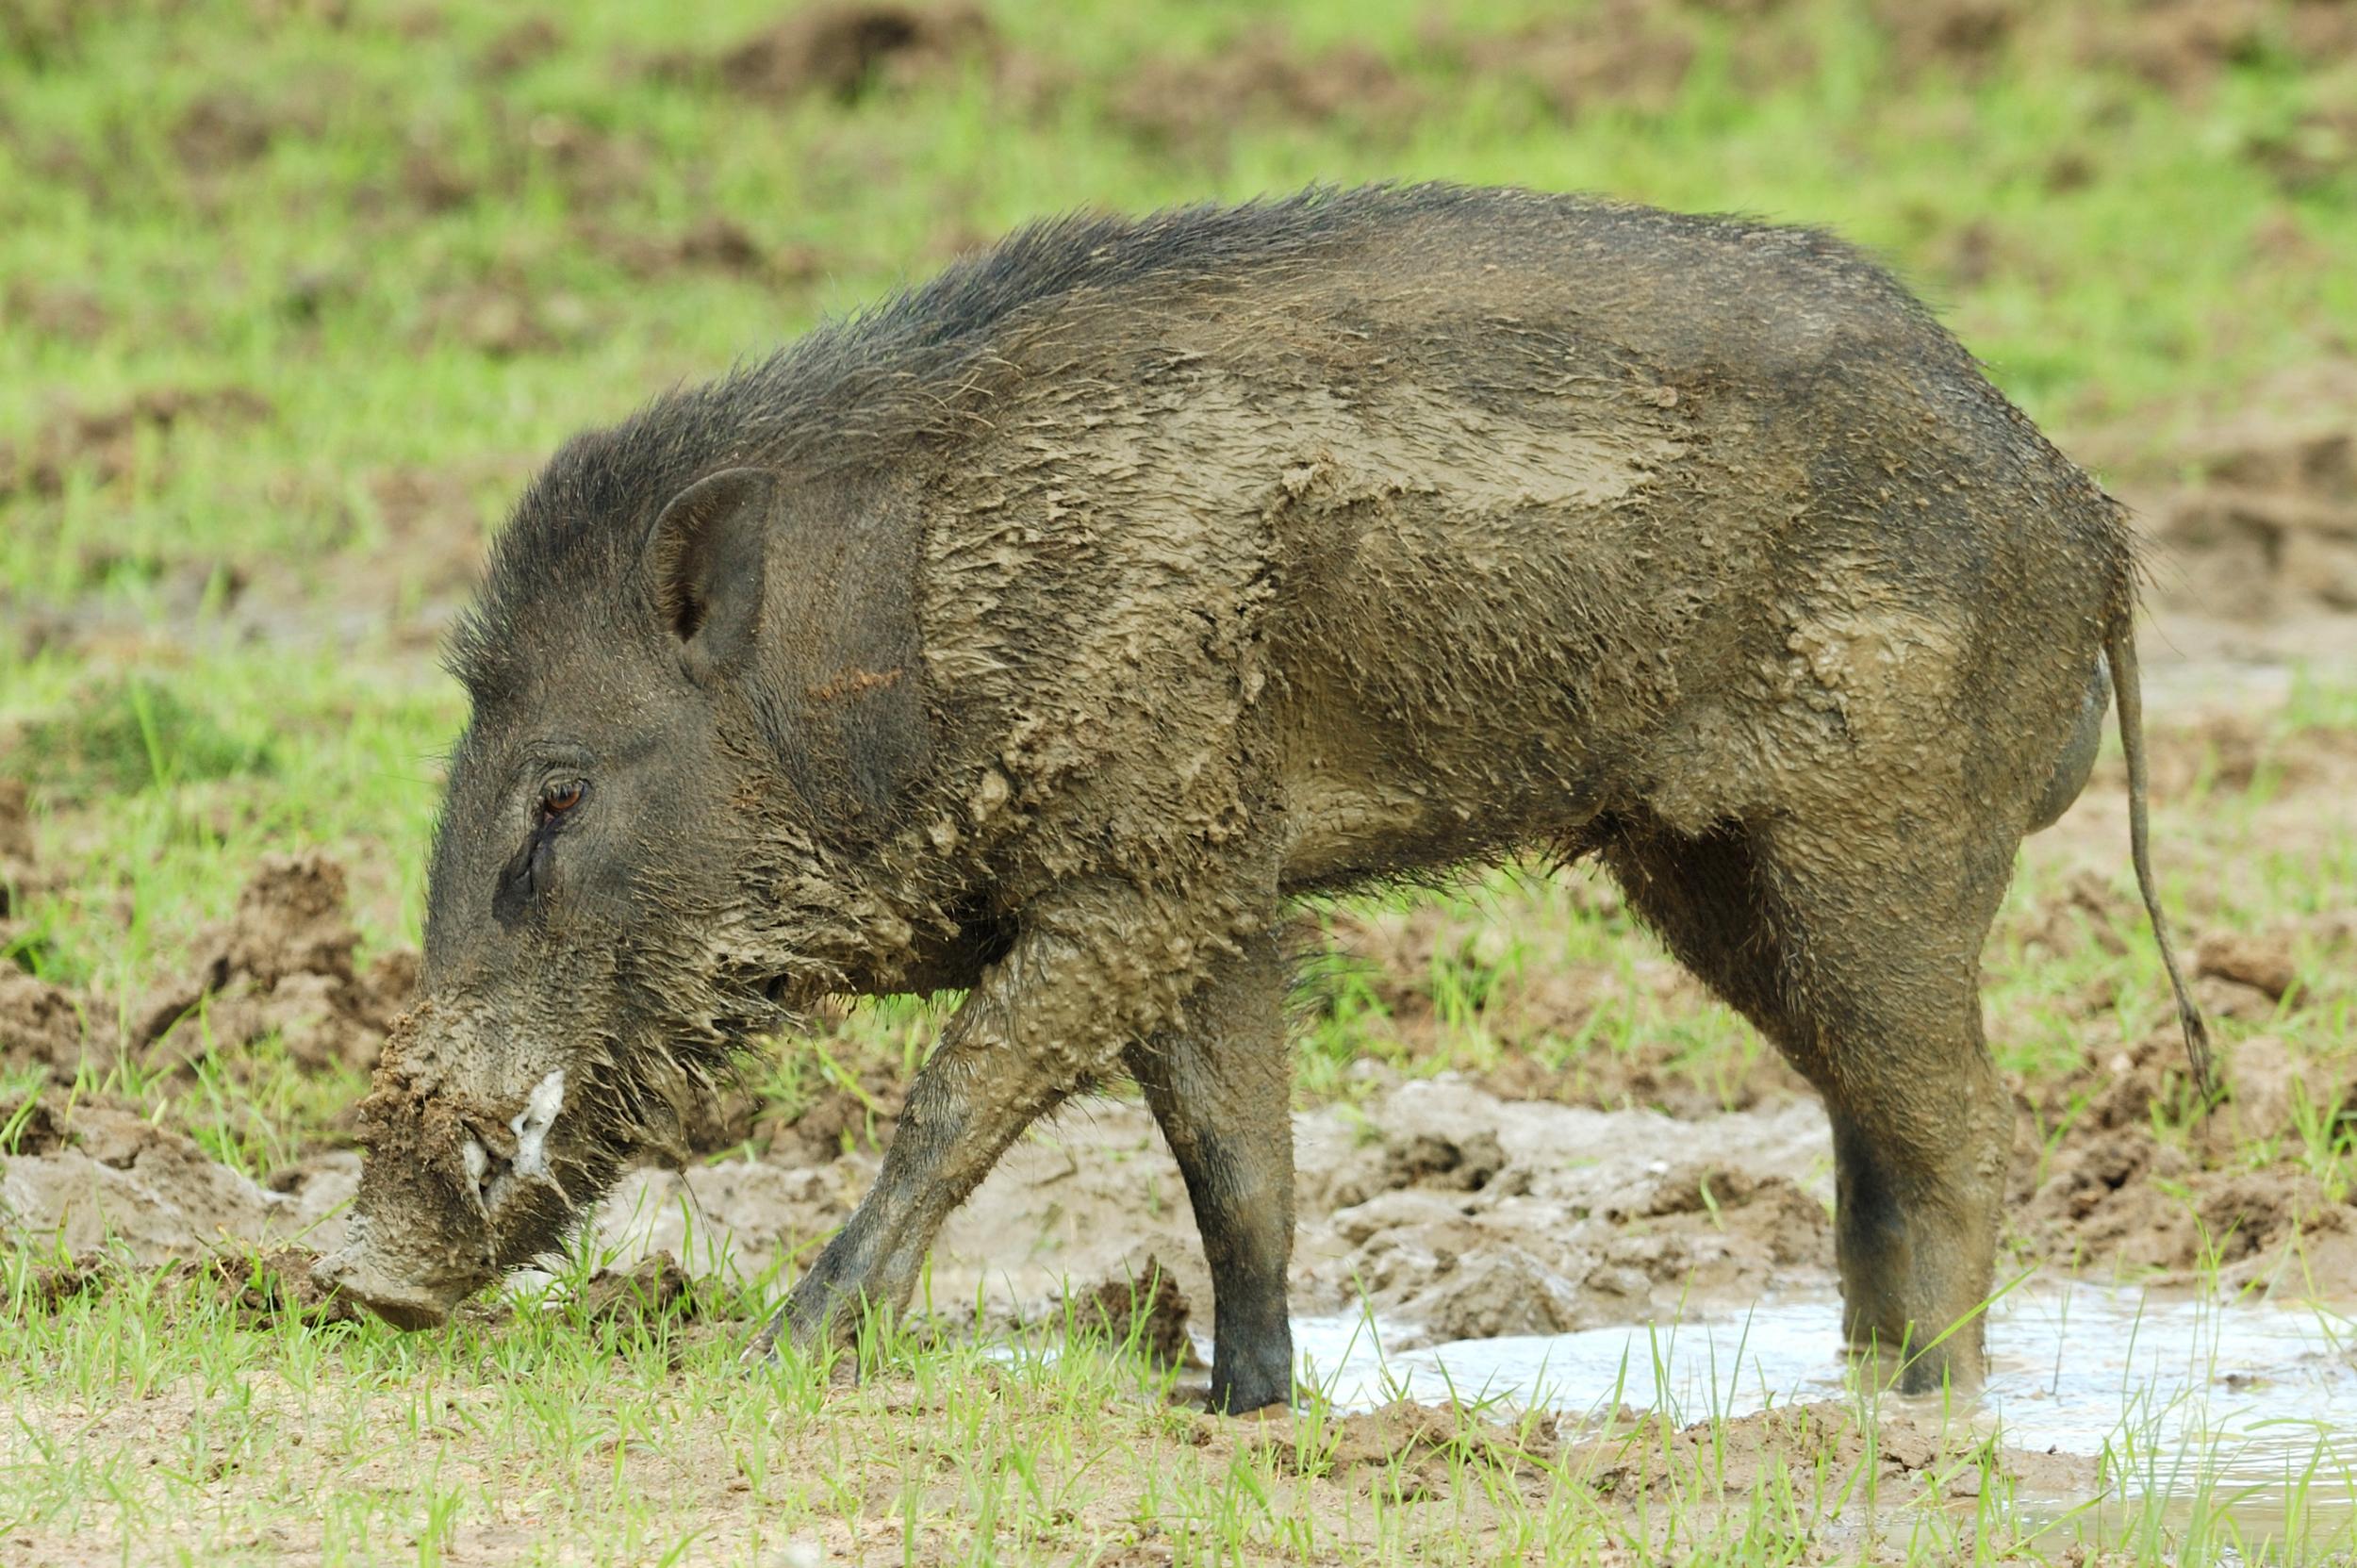 invite-to-paradise-sri-lanka-honeymoon-holiday-wildlife-safari-wild-boar.jpg